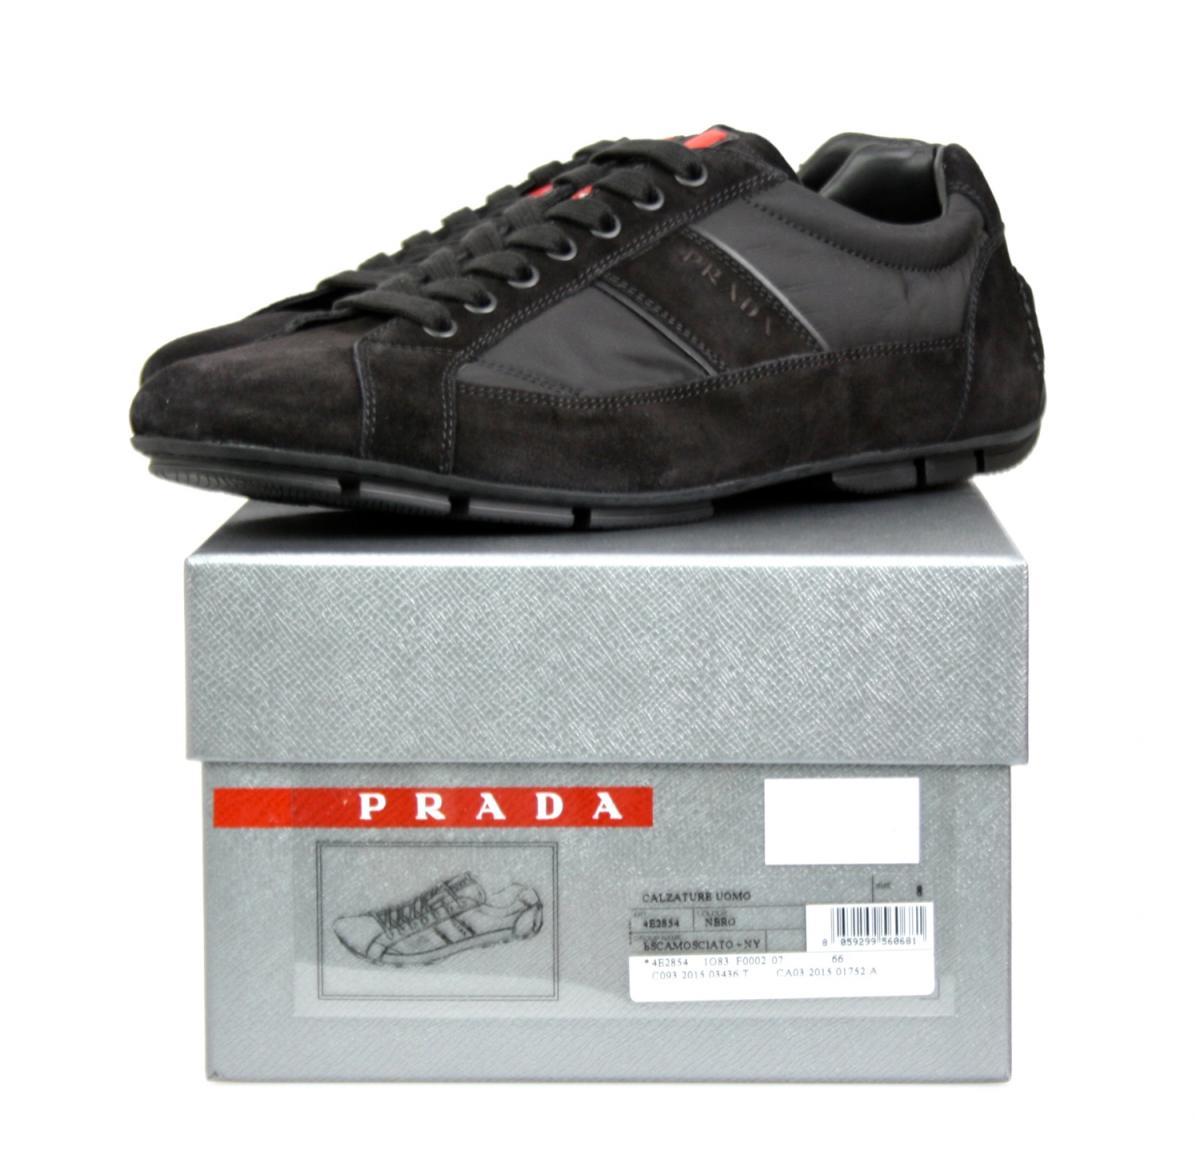 luxus prada monte carlo sneaker schuhe 4e2854 schwarz neu new 7 41 41 5 ebay. Black Bedroom Furniture Sets. Home Design Ideas